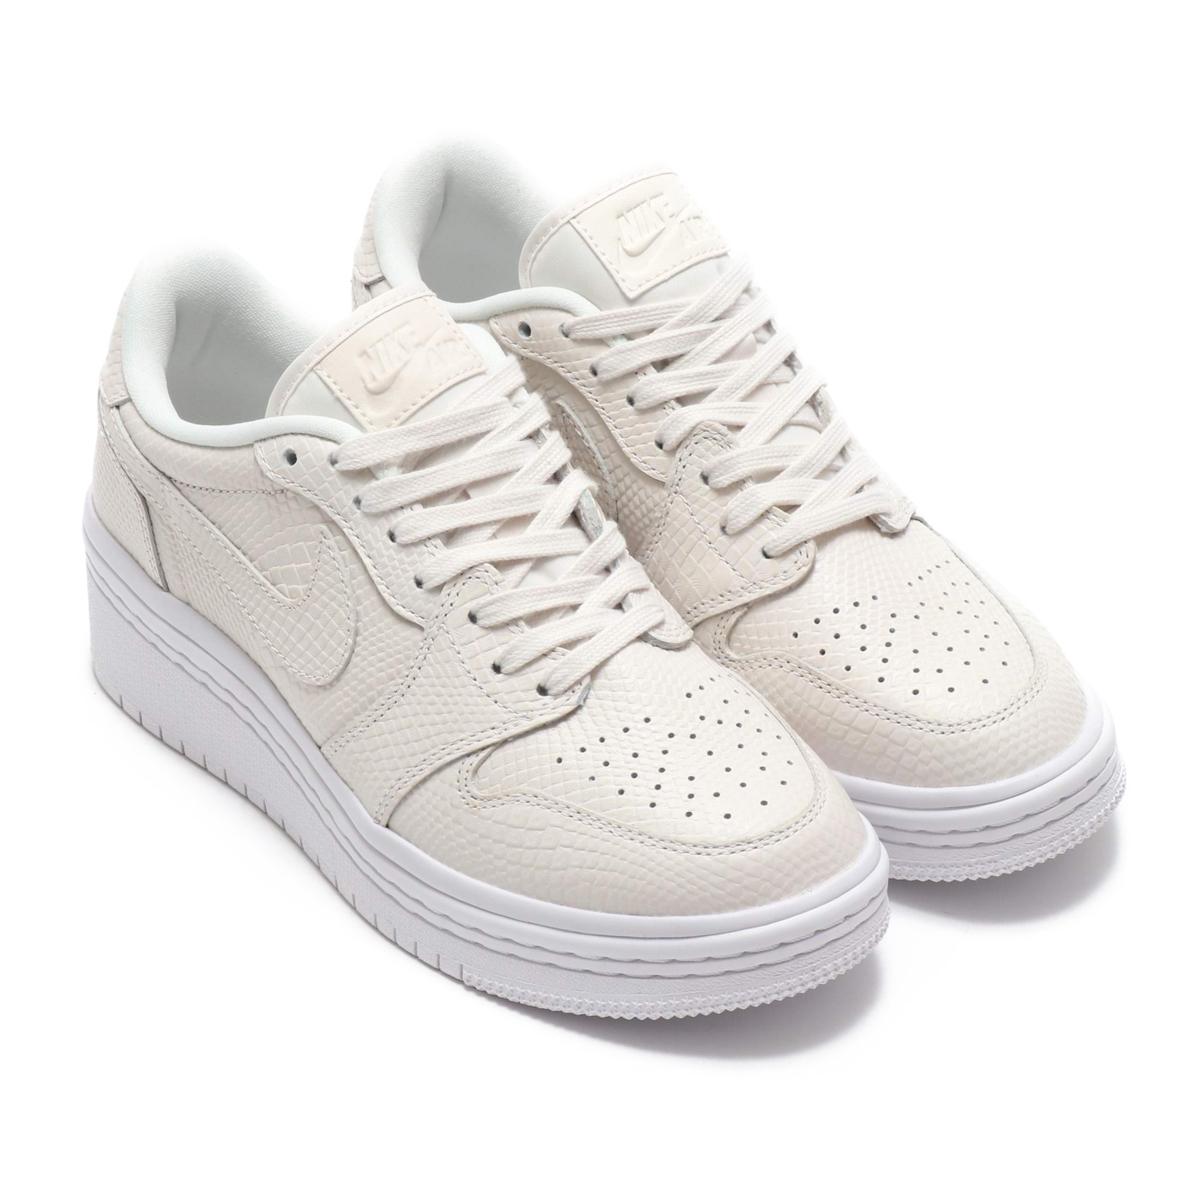 NIKE WMNS AIR JORDAN 1 RE LOW LIFTD (PHANTOM PHANTOM-WHITE) (Nike women Air  Jordan 1 nostalgic low LIFTED)18FA-S 4848119248